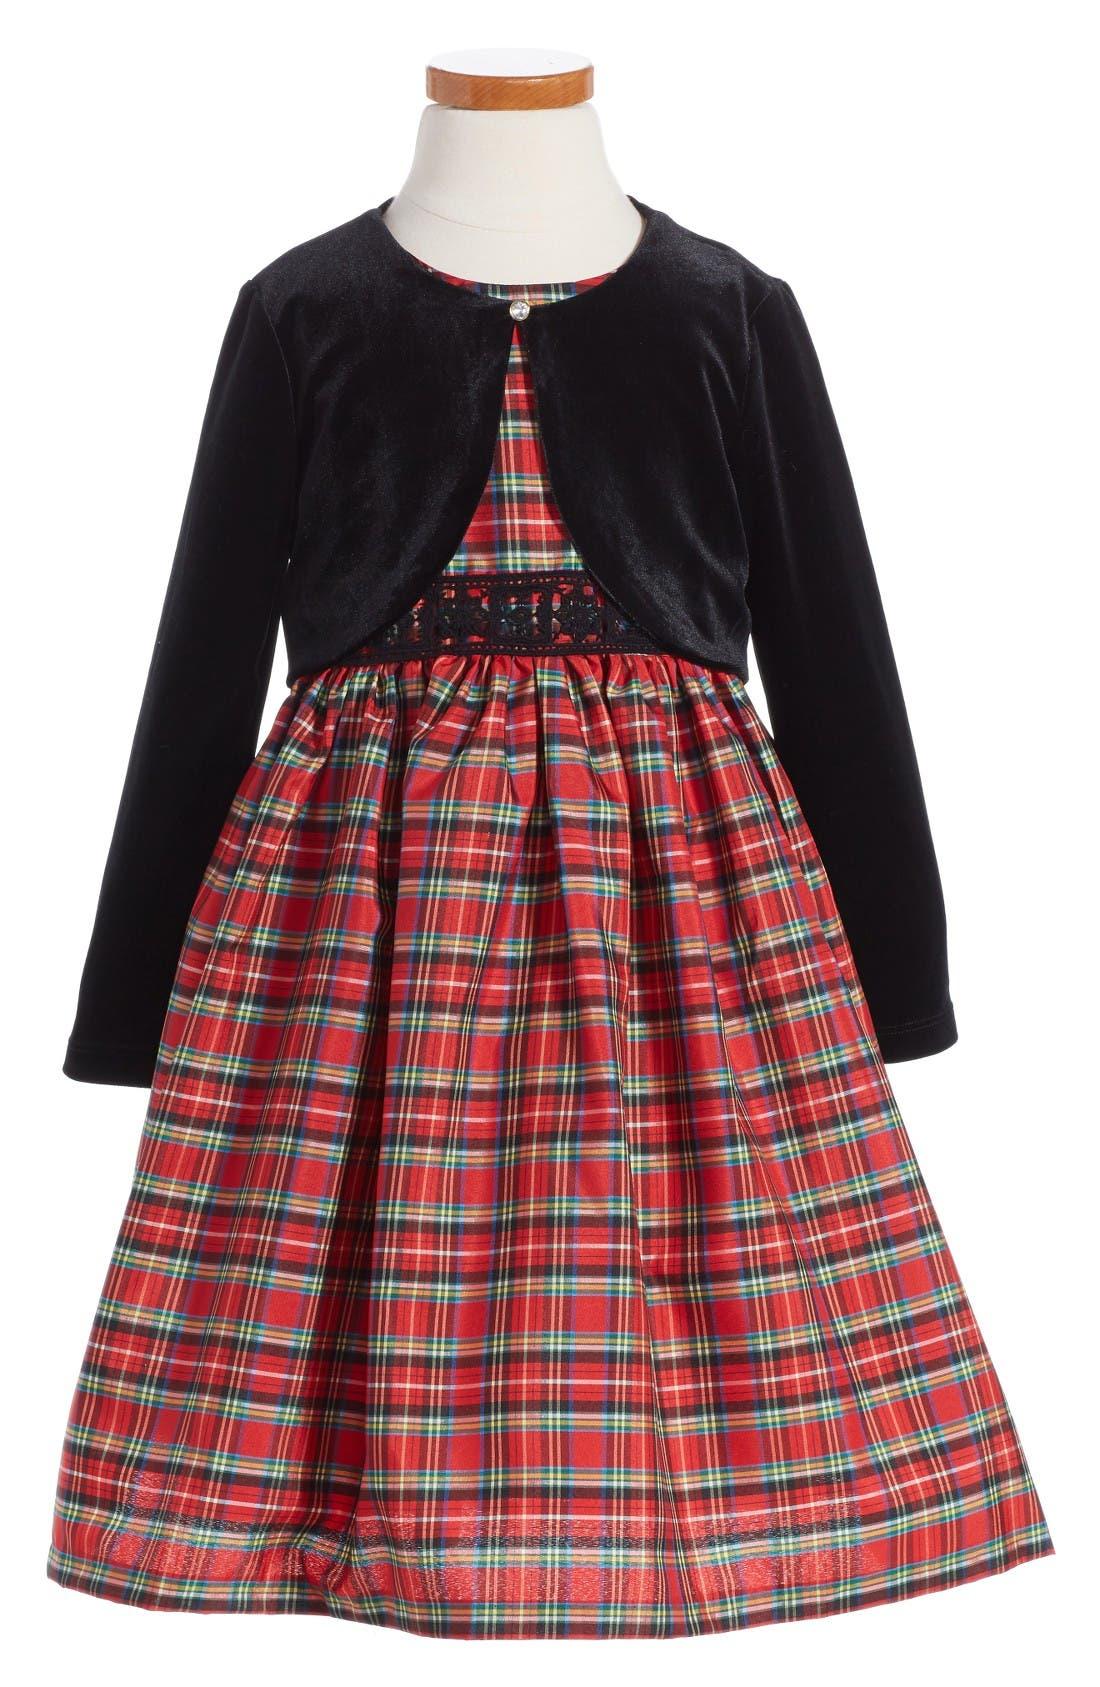 Main Image - Pippa & Julie Plaid Dress & Velvet Jacket (Toddler Girls, Little Girls & Big Girls)